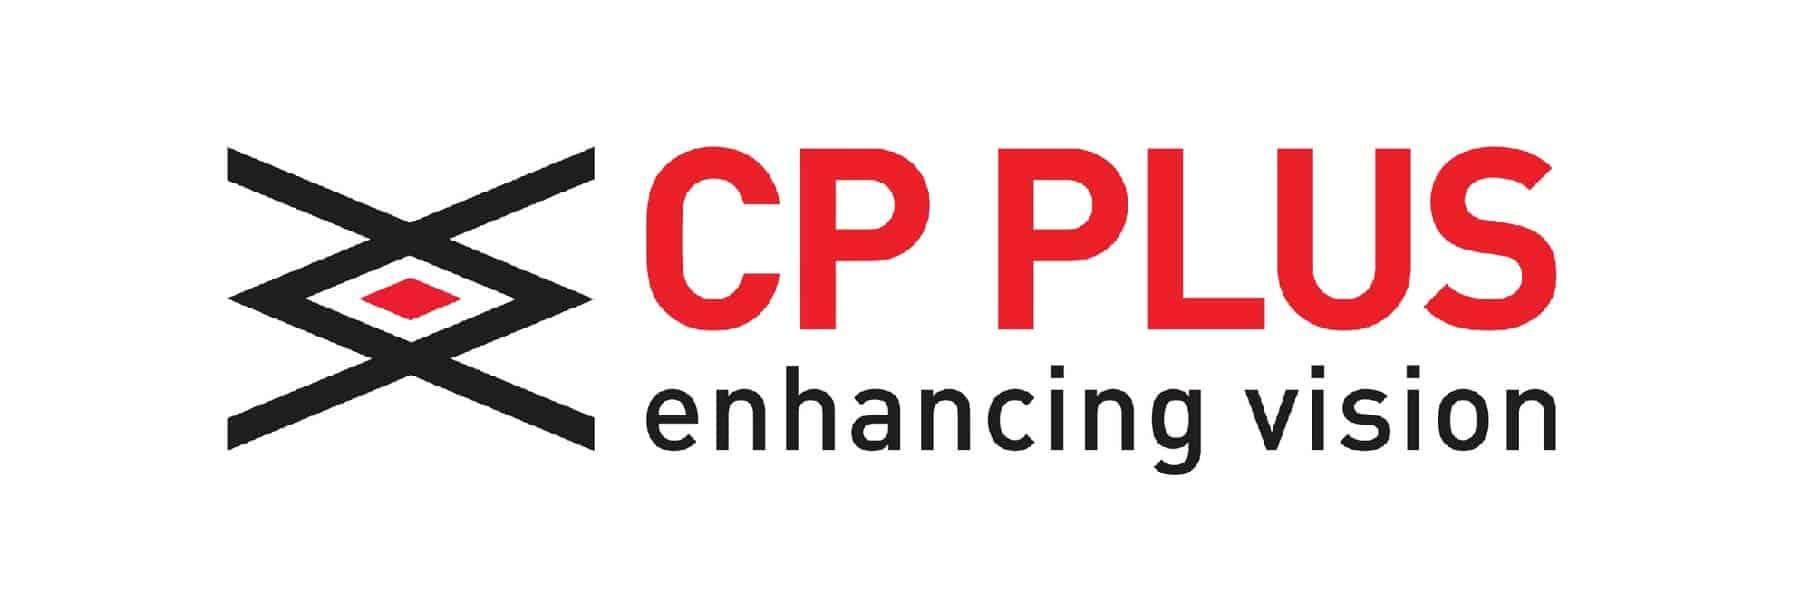 cp plus enhancing vision